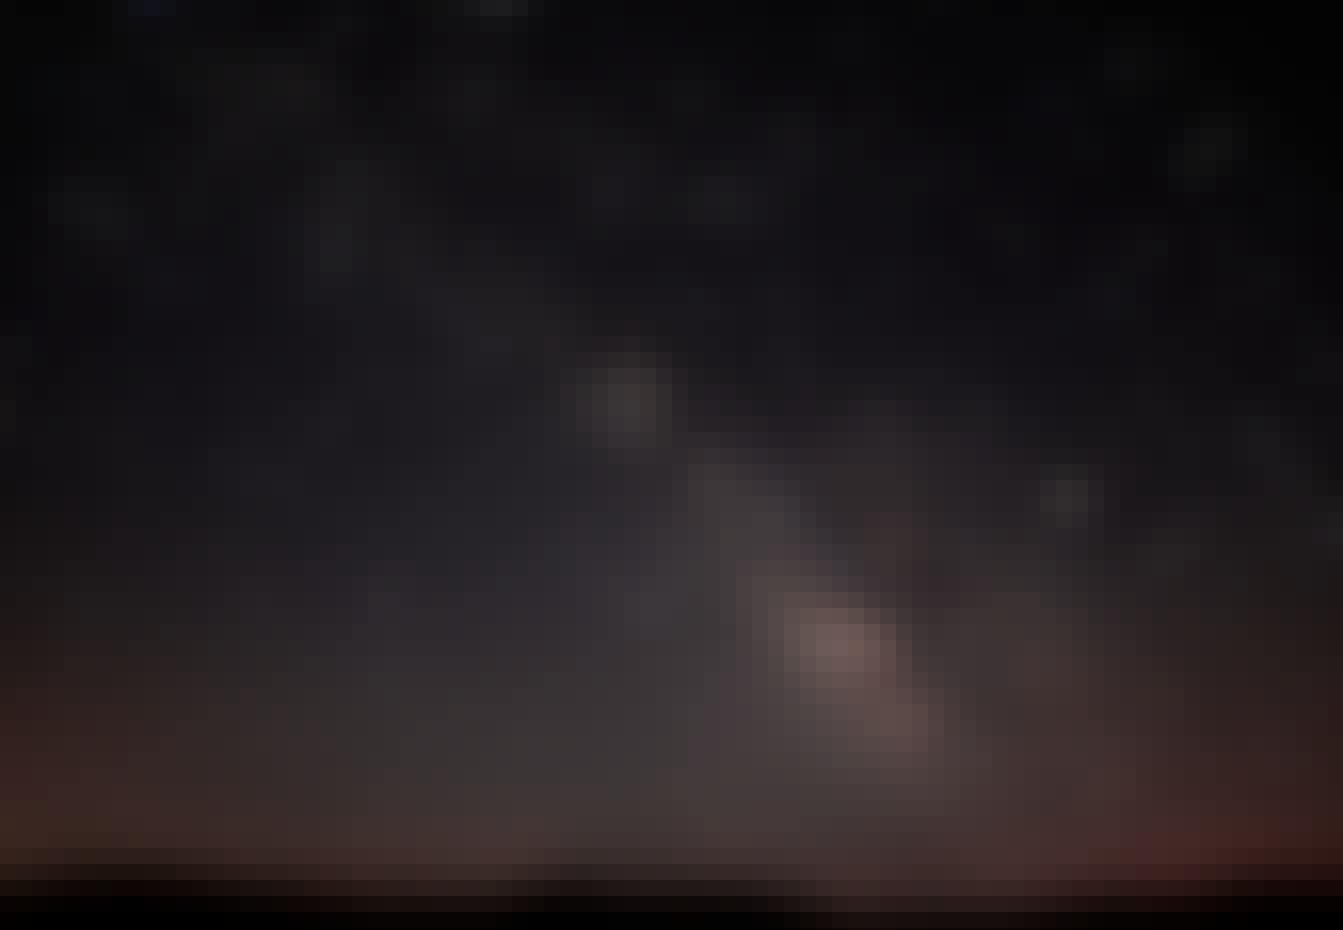 Stjernebilleder på nattehimlen